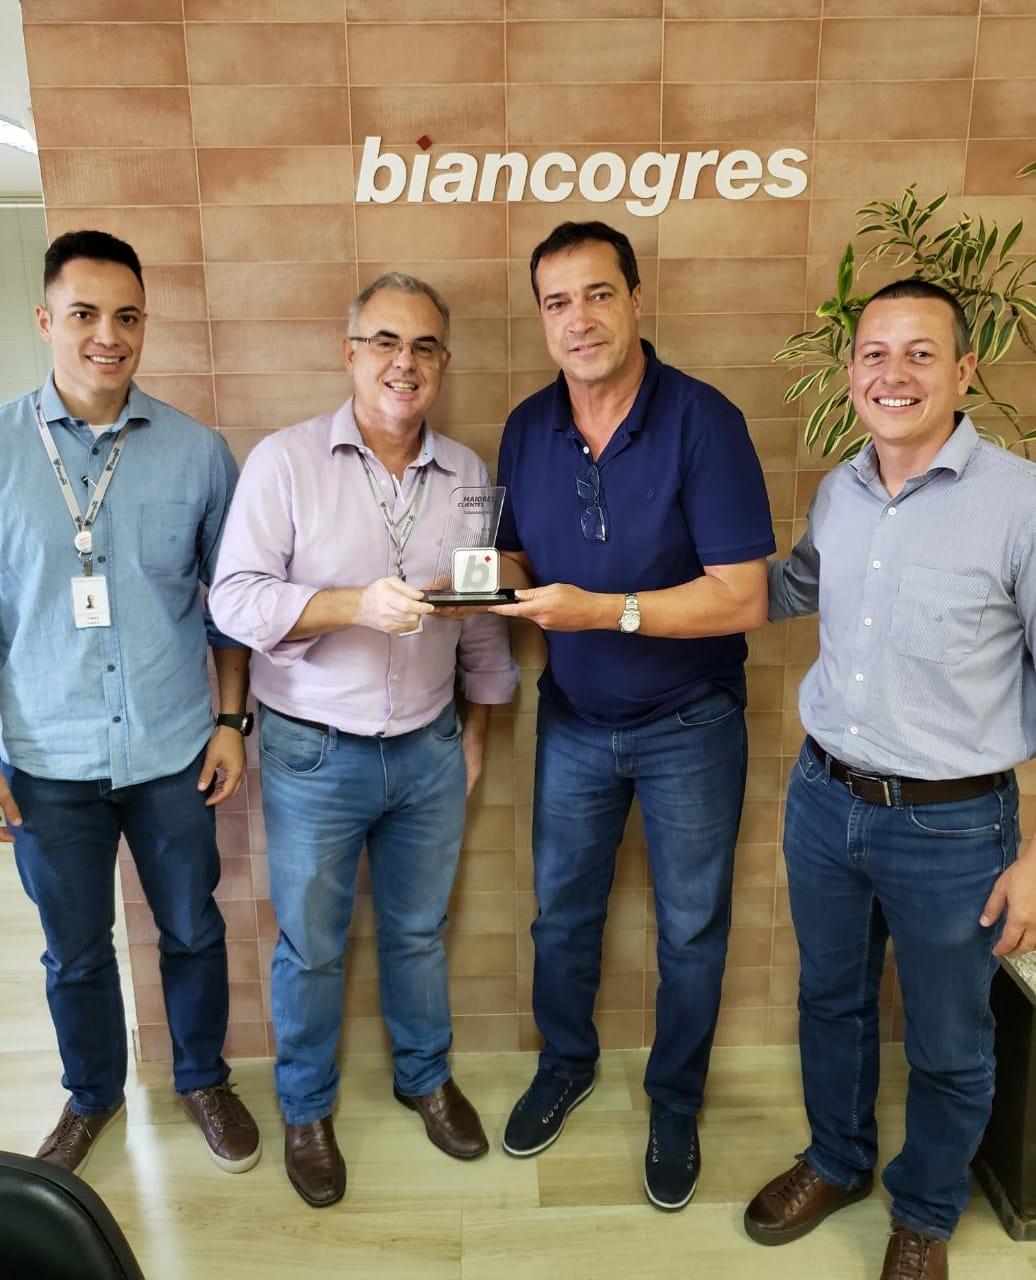 Prêmio Biancogres